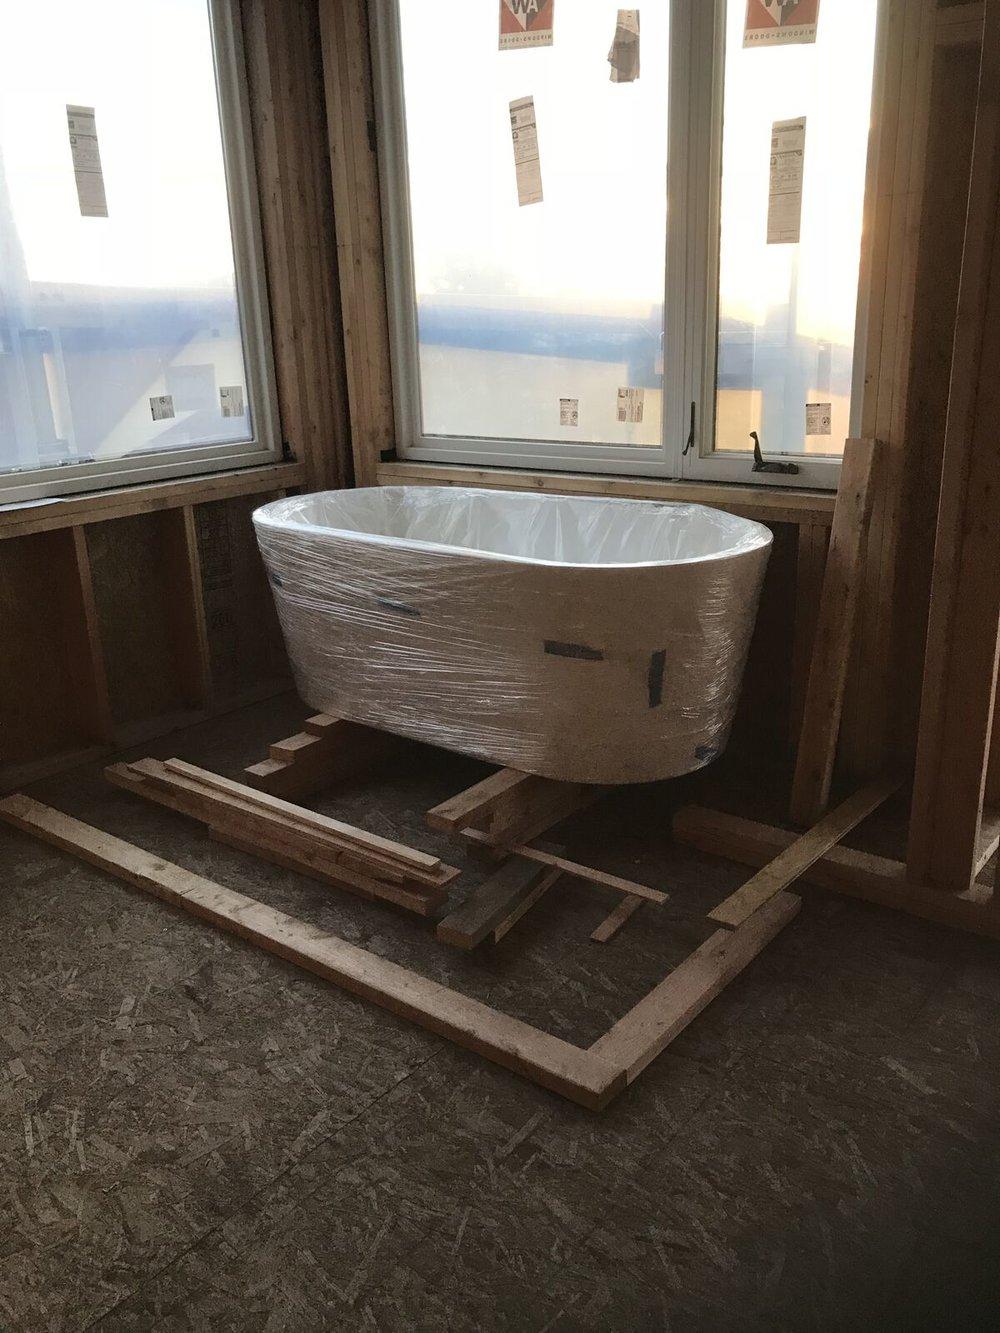 23 the tub.jpeg